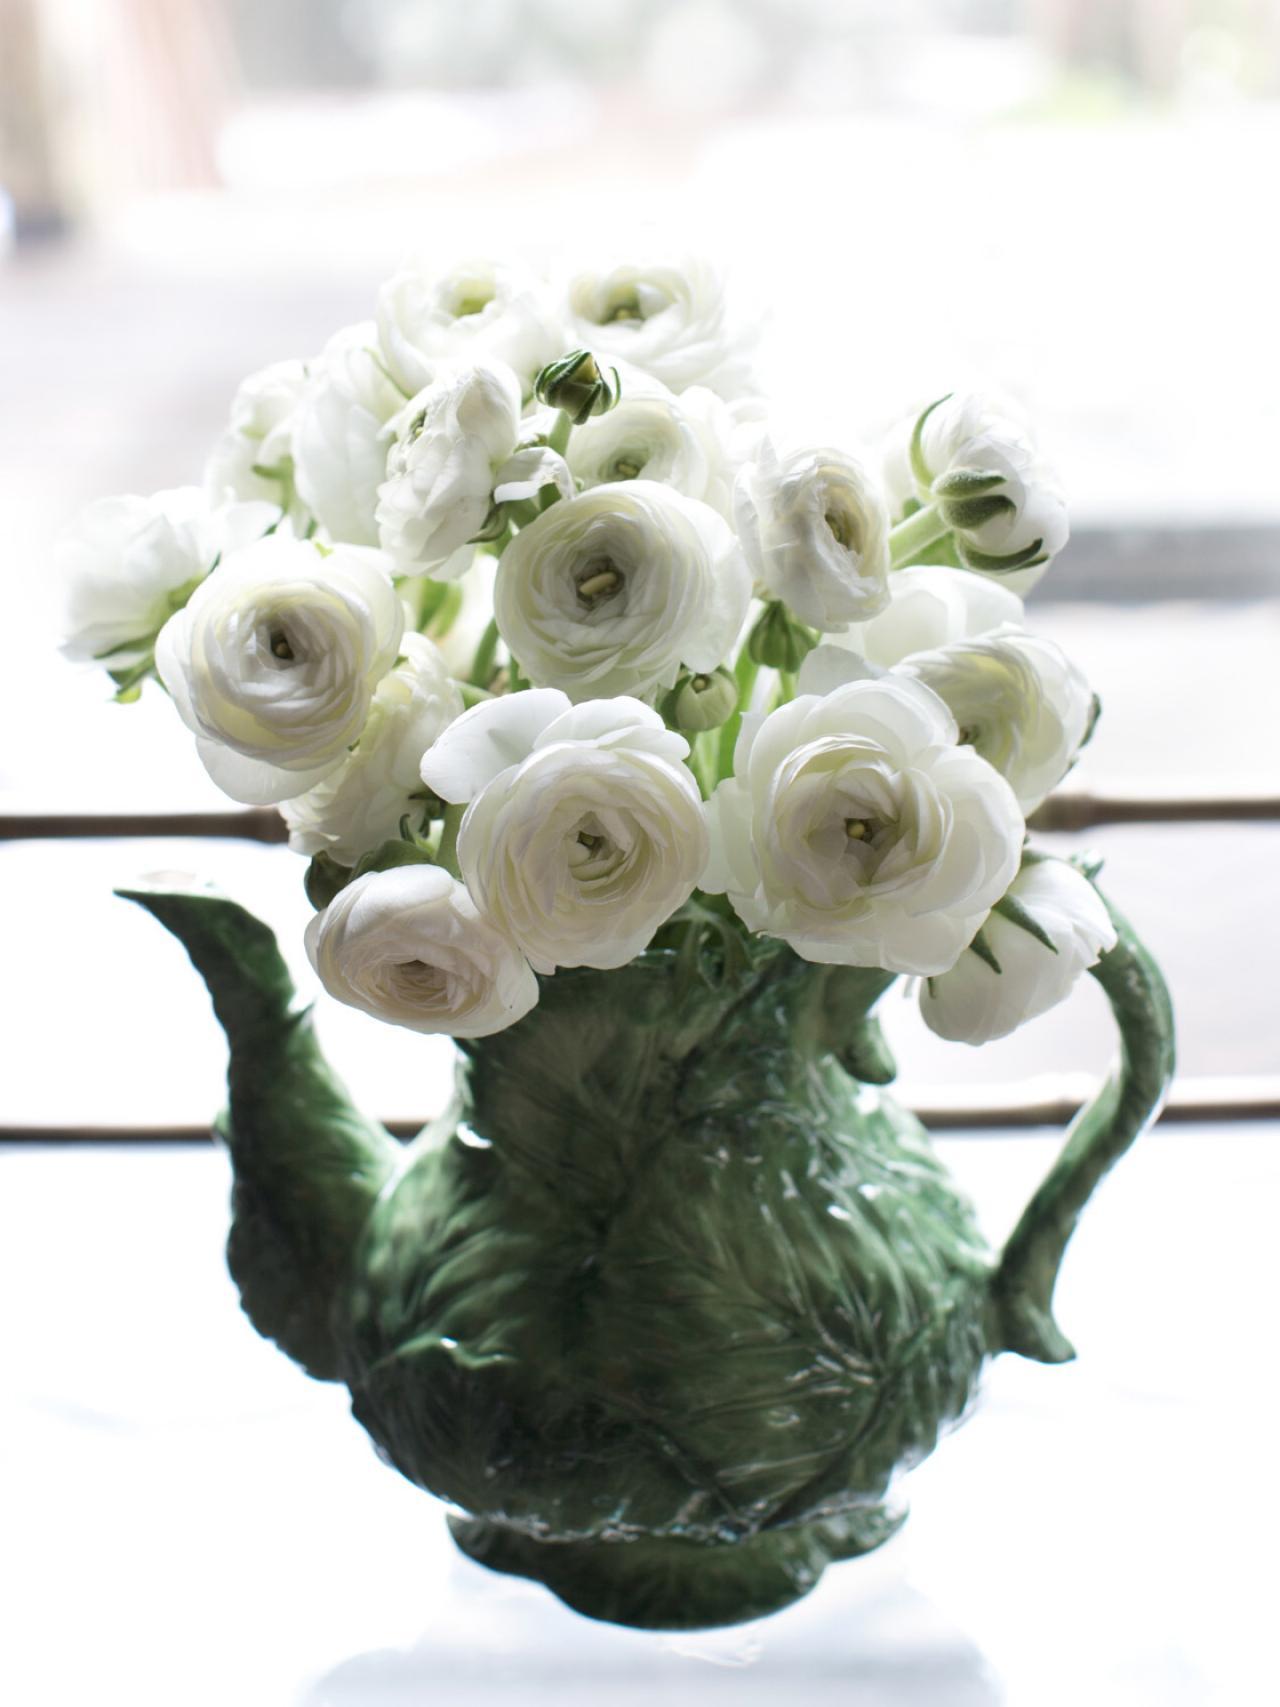 Homemade Flower Preservative Spring Flower Arrangements Interior Design Styles And